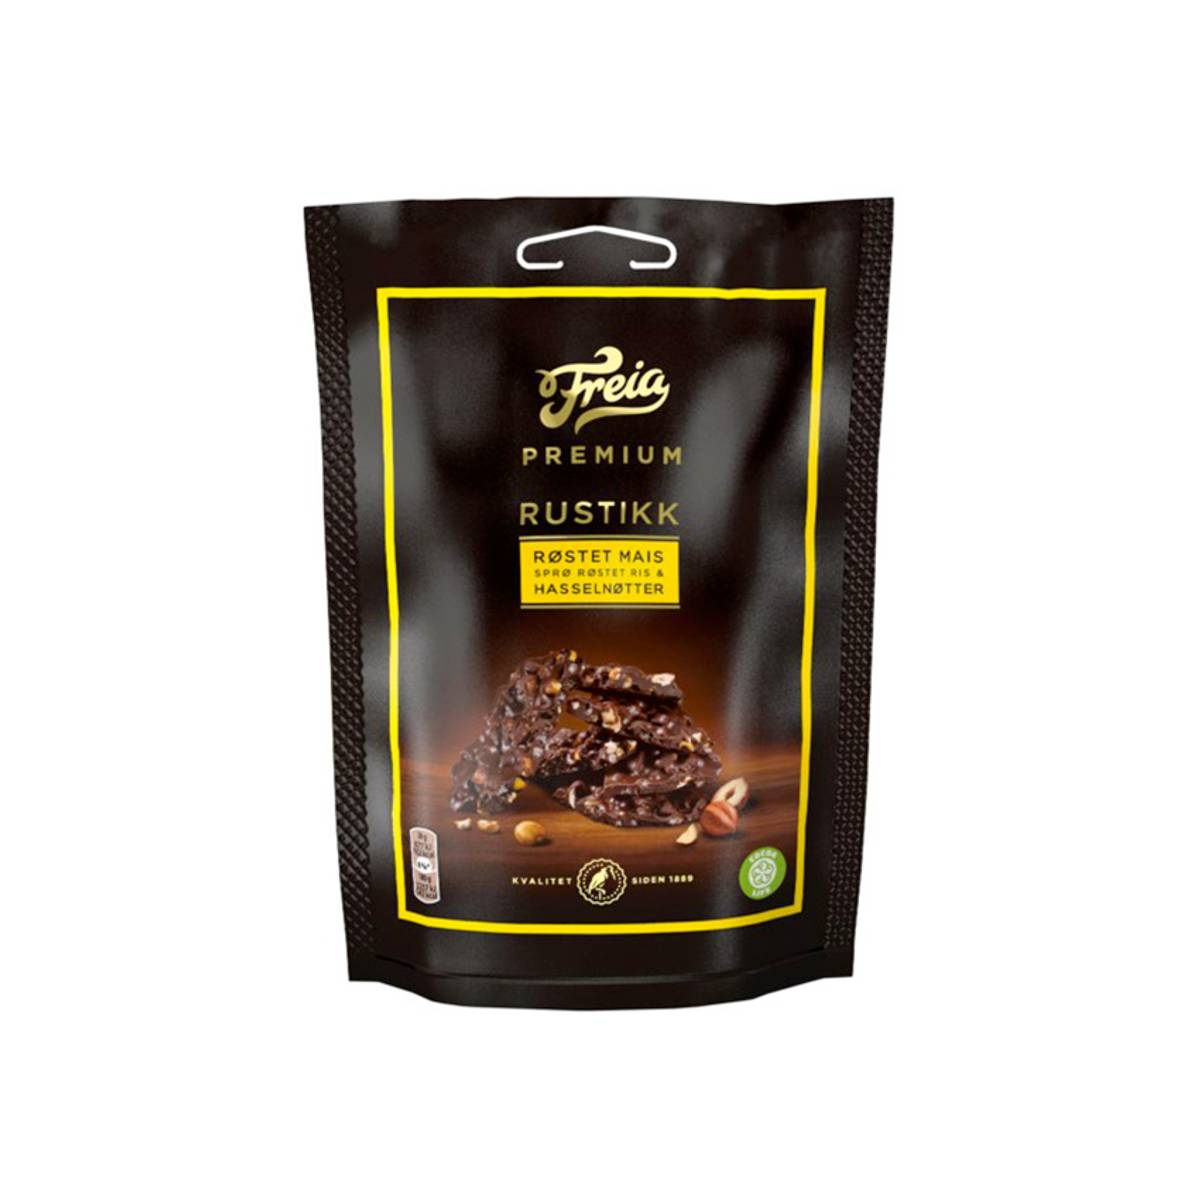 Premium Rustikk Mais & Hasselnøtter